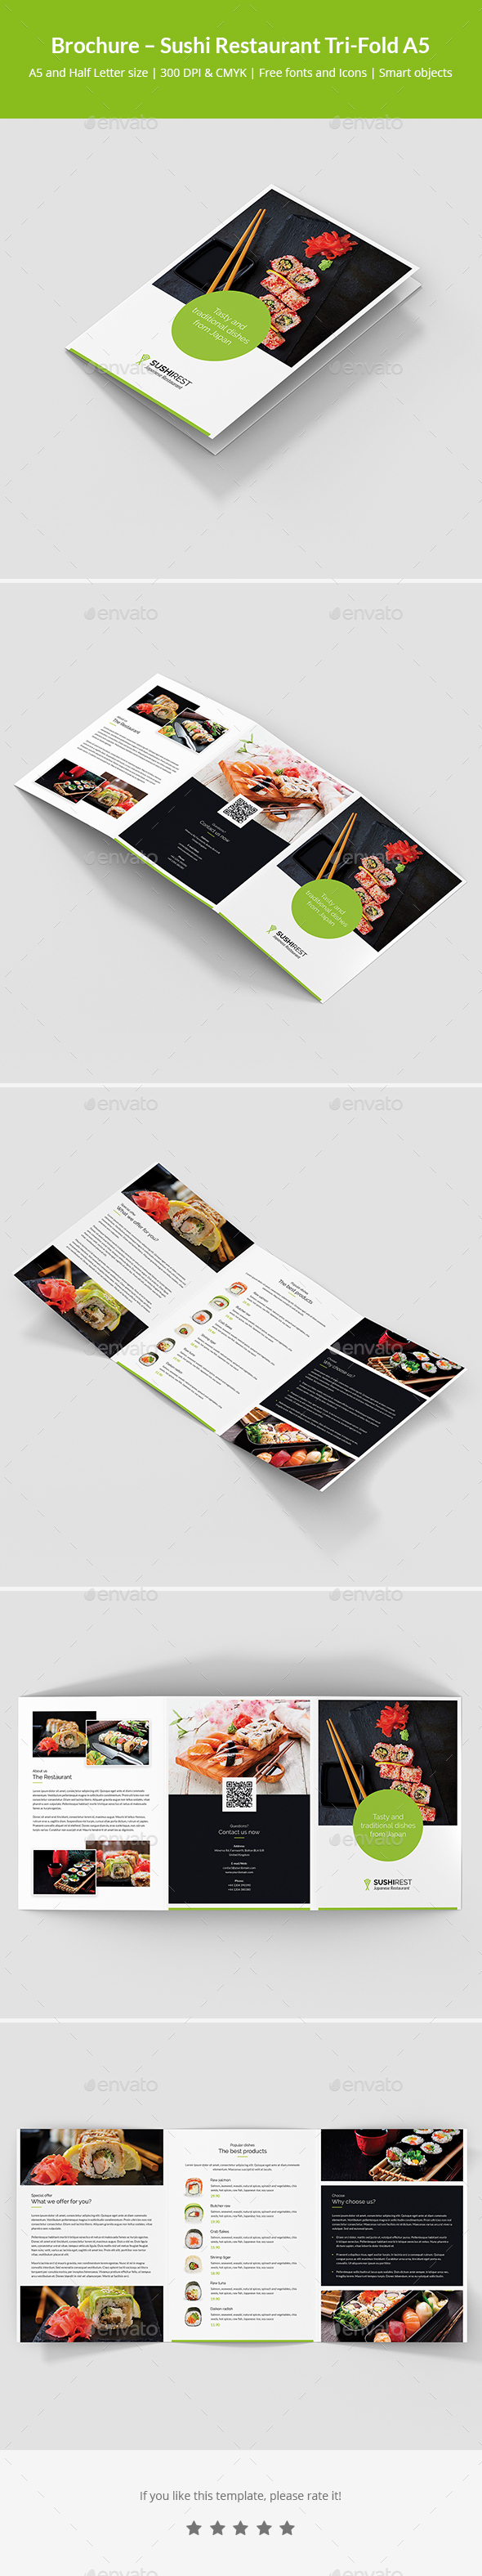 GraphicRiver Brochure Sushi Restaurant Tri-Fold A5 21135418